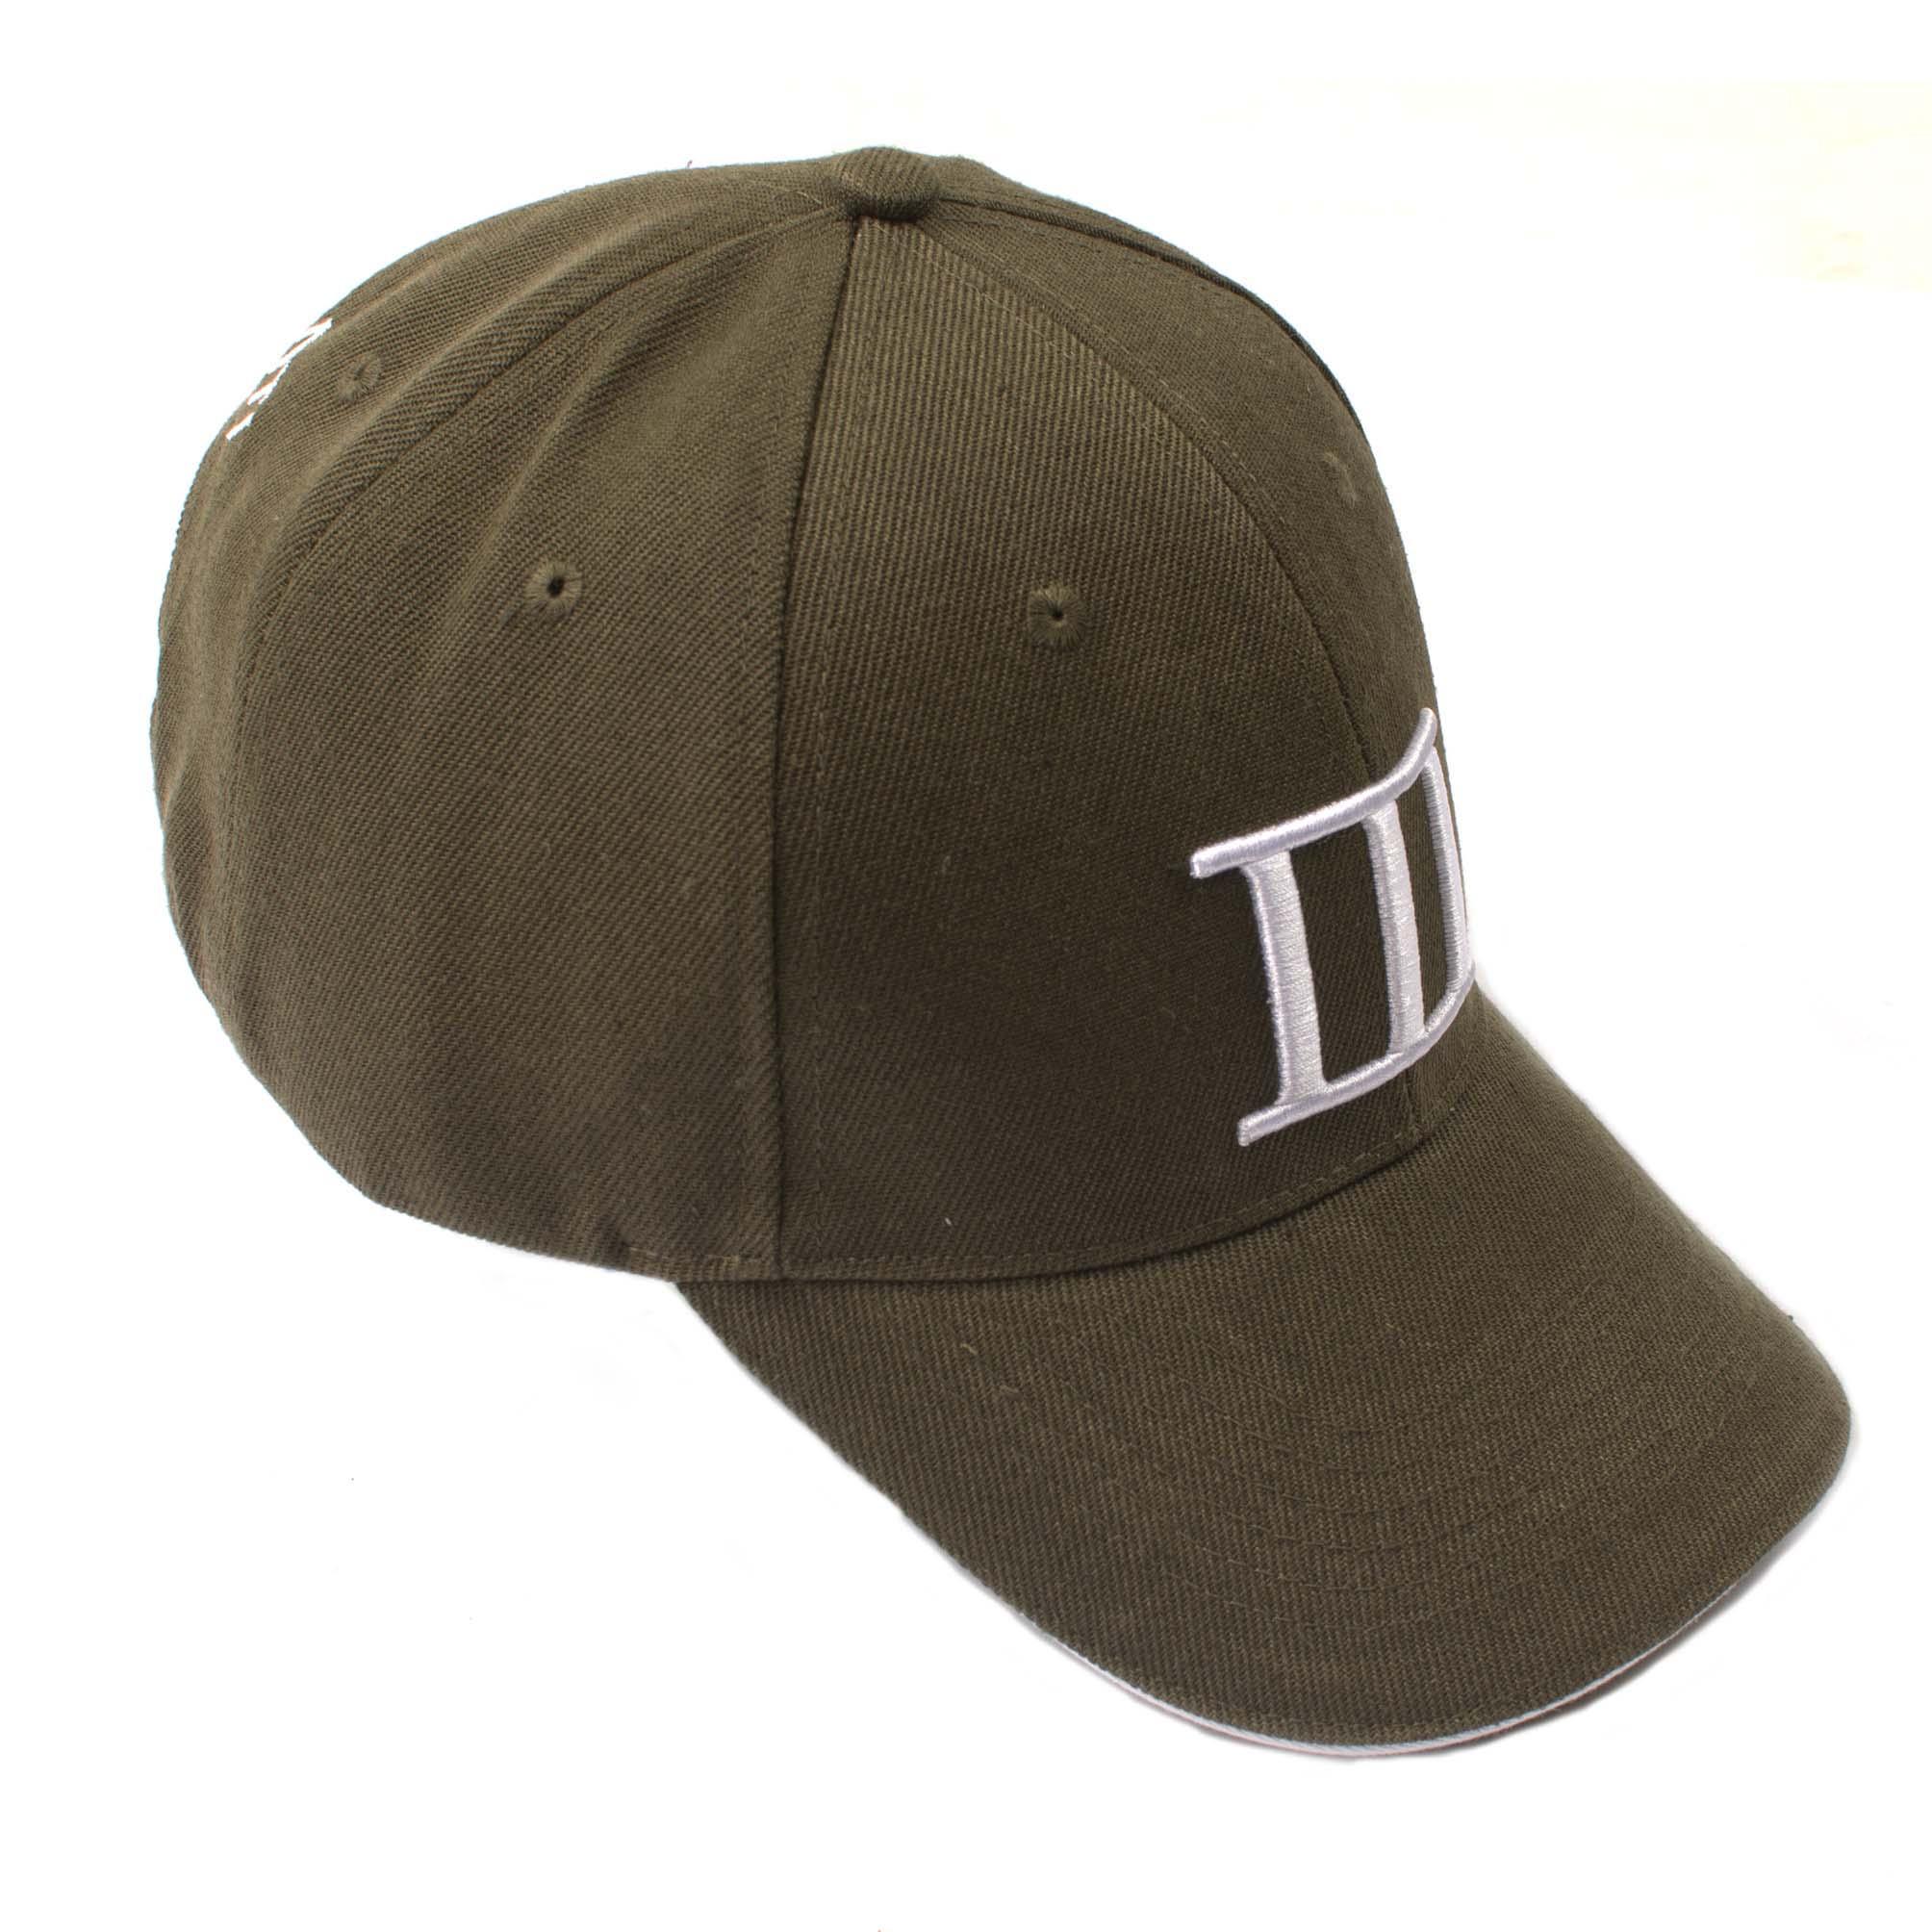 Cap branded Tresanti army green